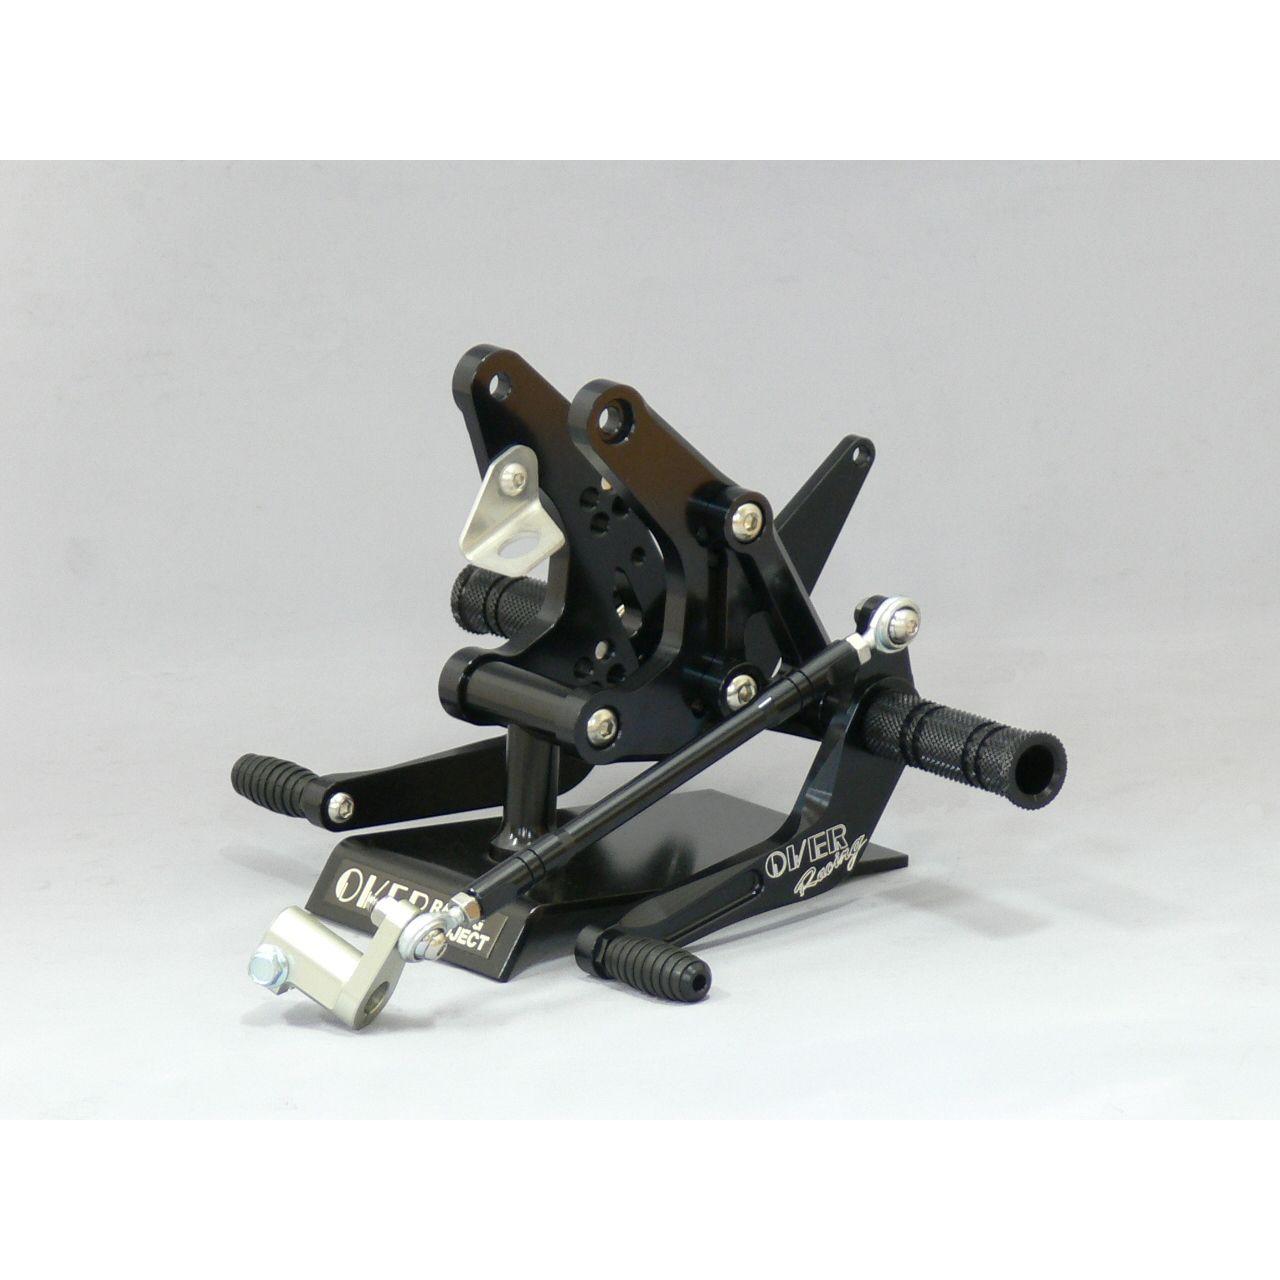 【OVER】腳踏後移套件競賽型(鼓式煞車專用) - 「Webike-摩托百貨」